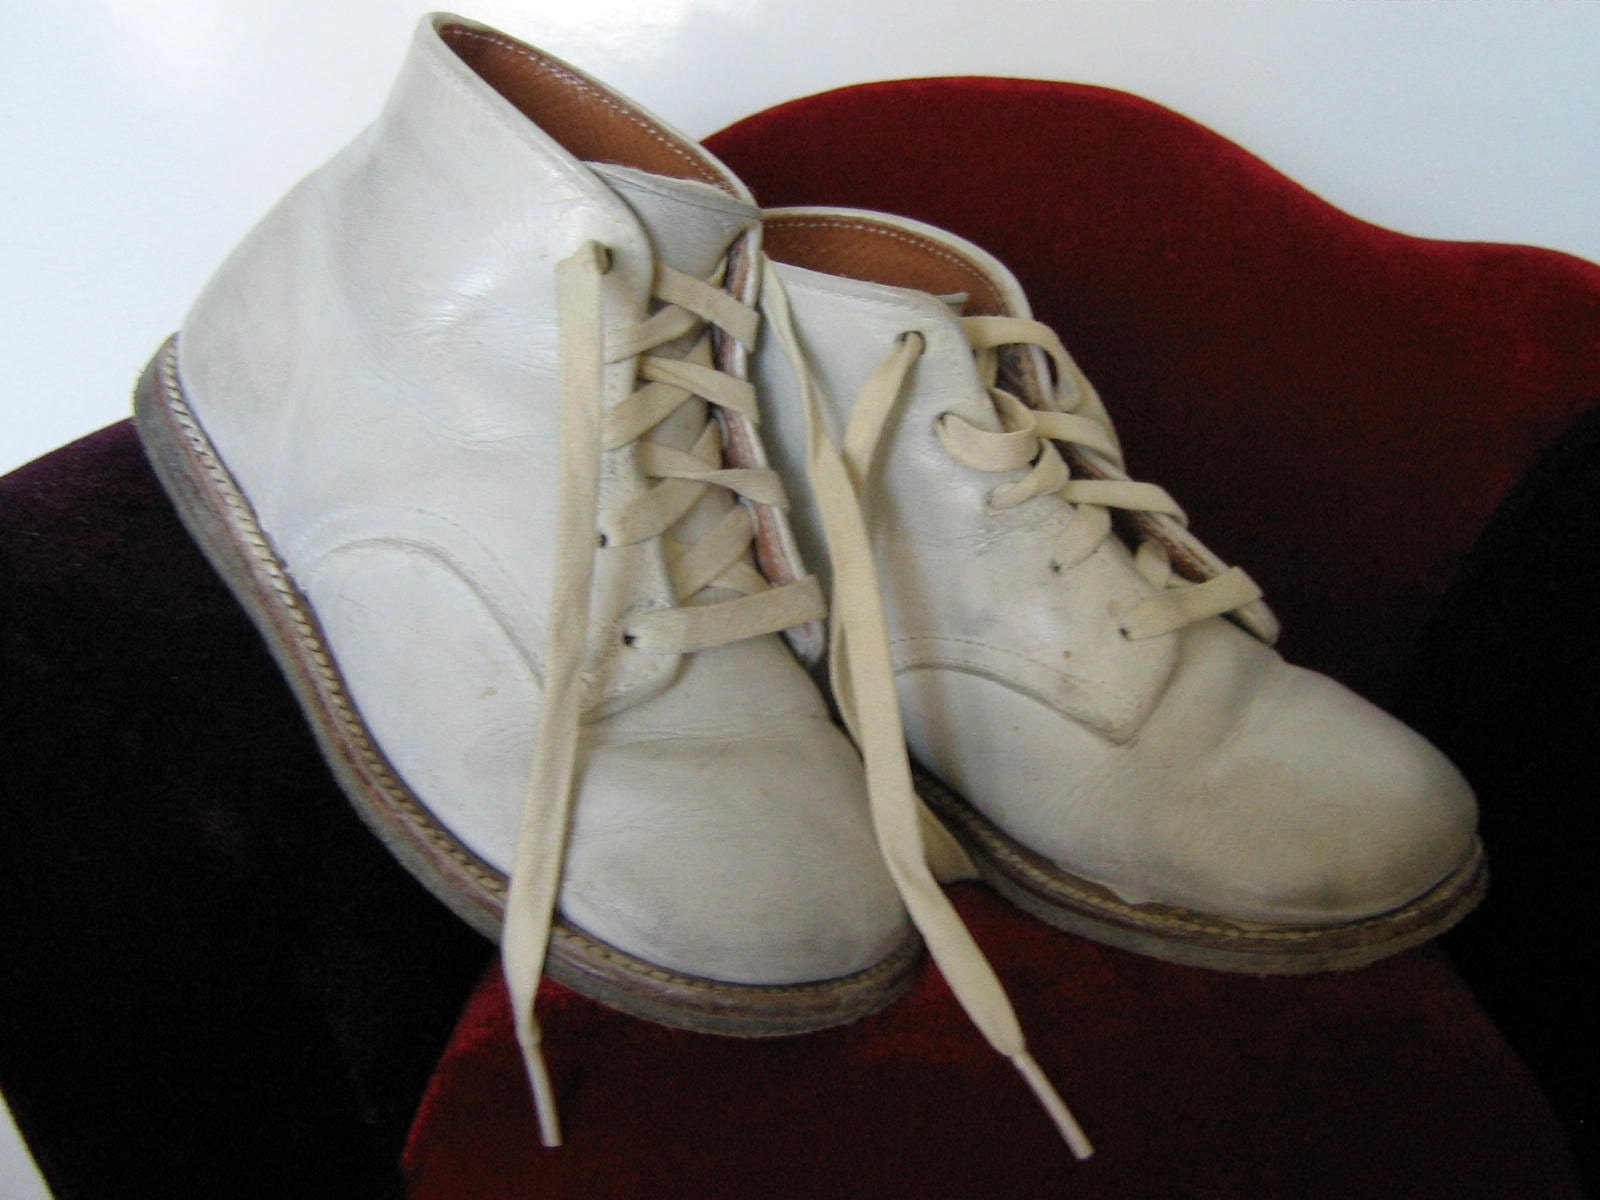 Vintage Stride Rite Baby Shoes Tbravovintage Etsy